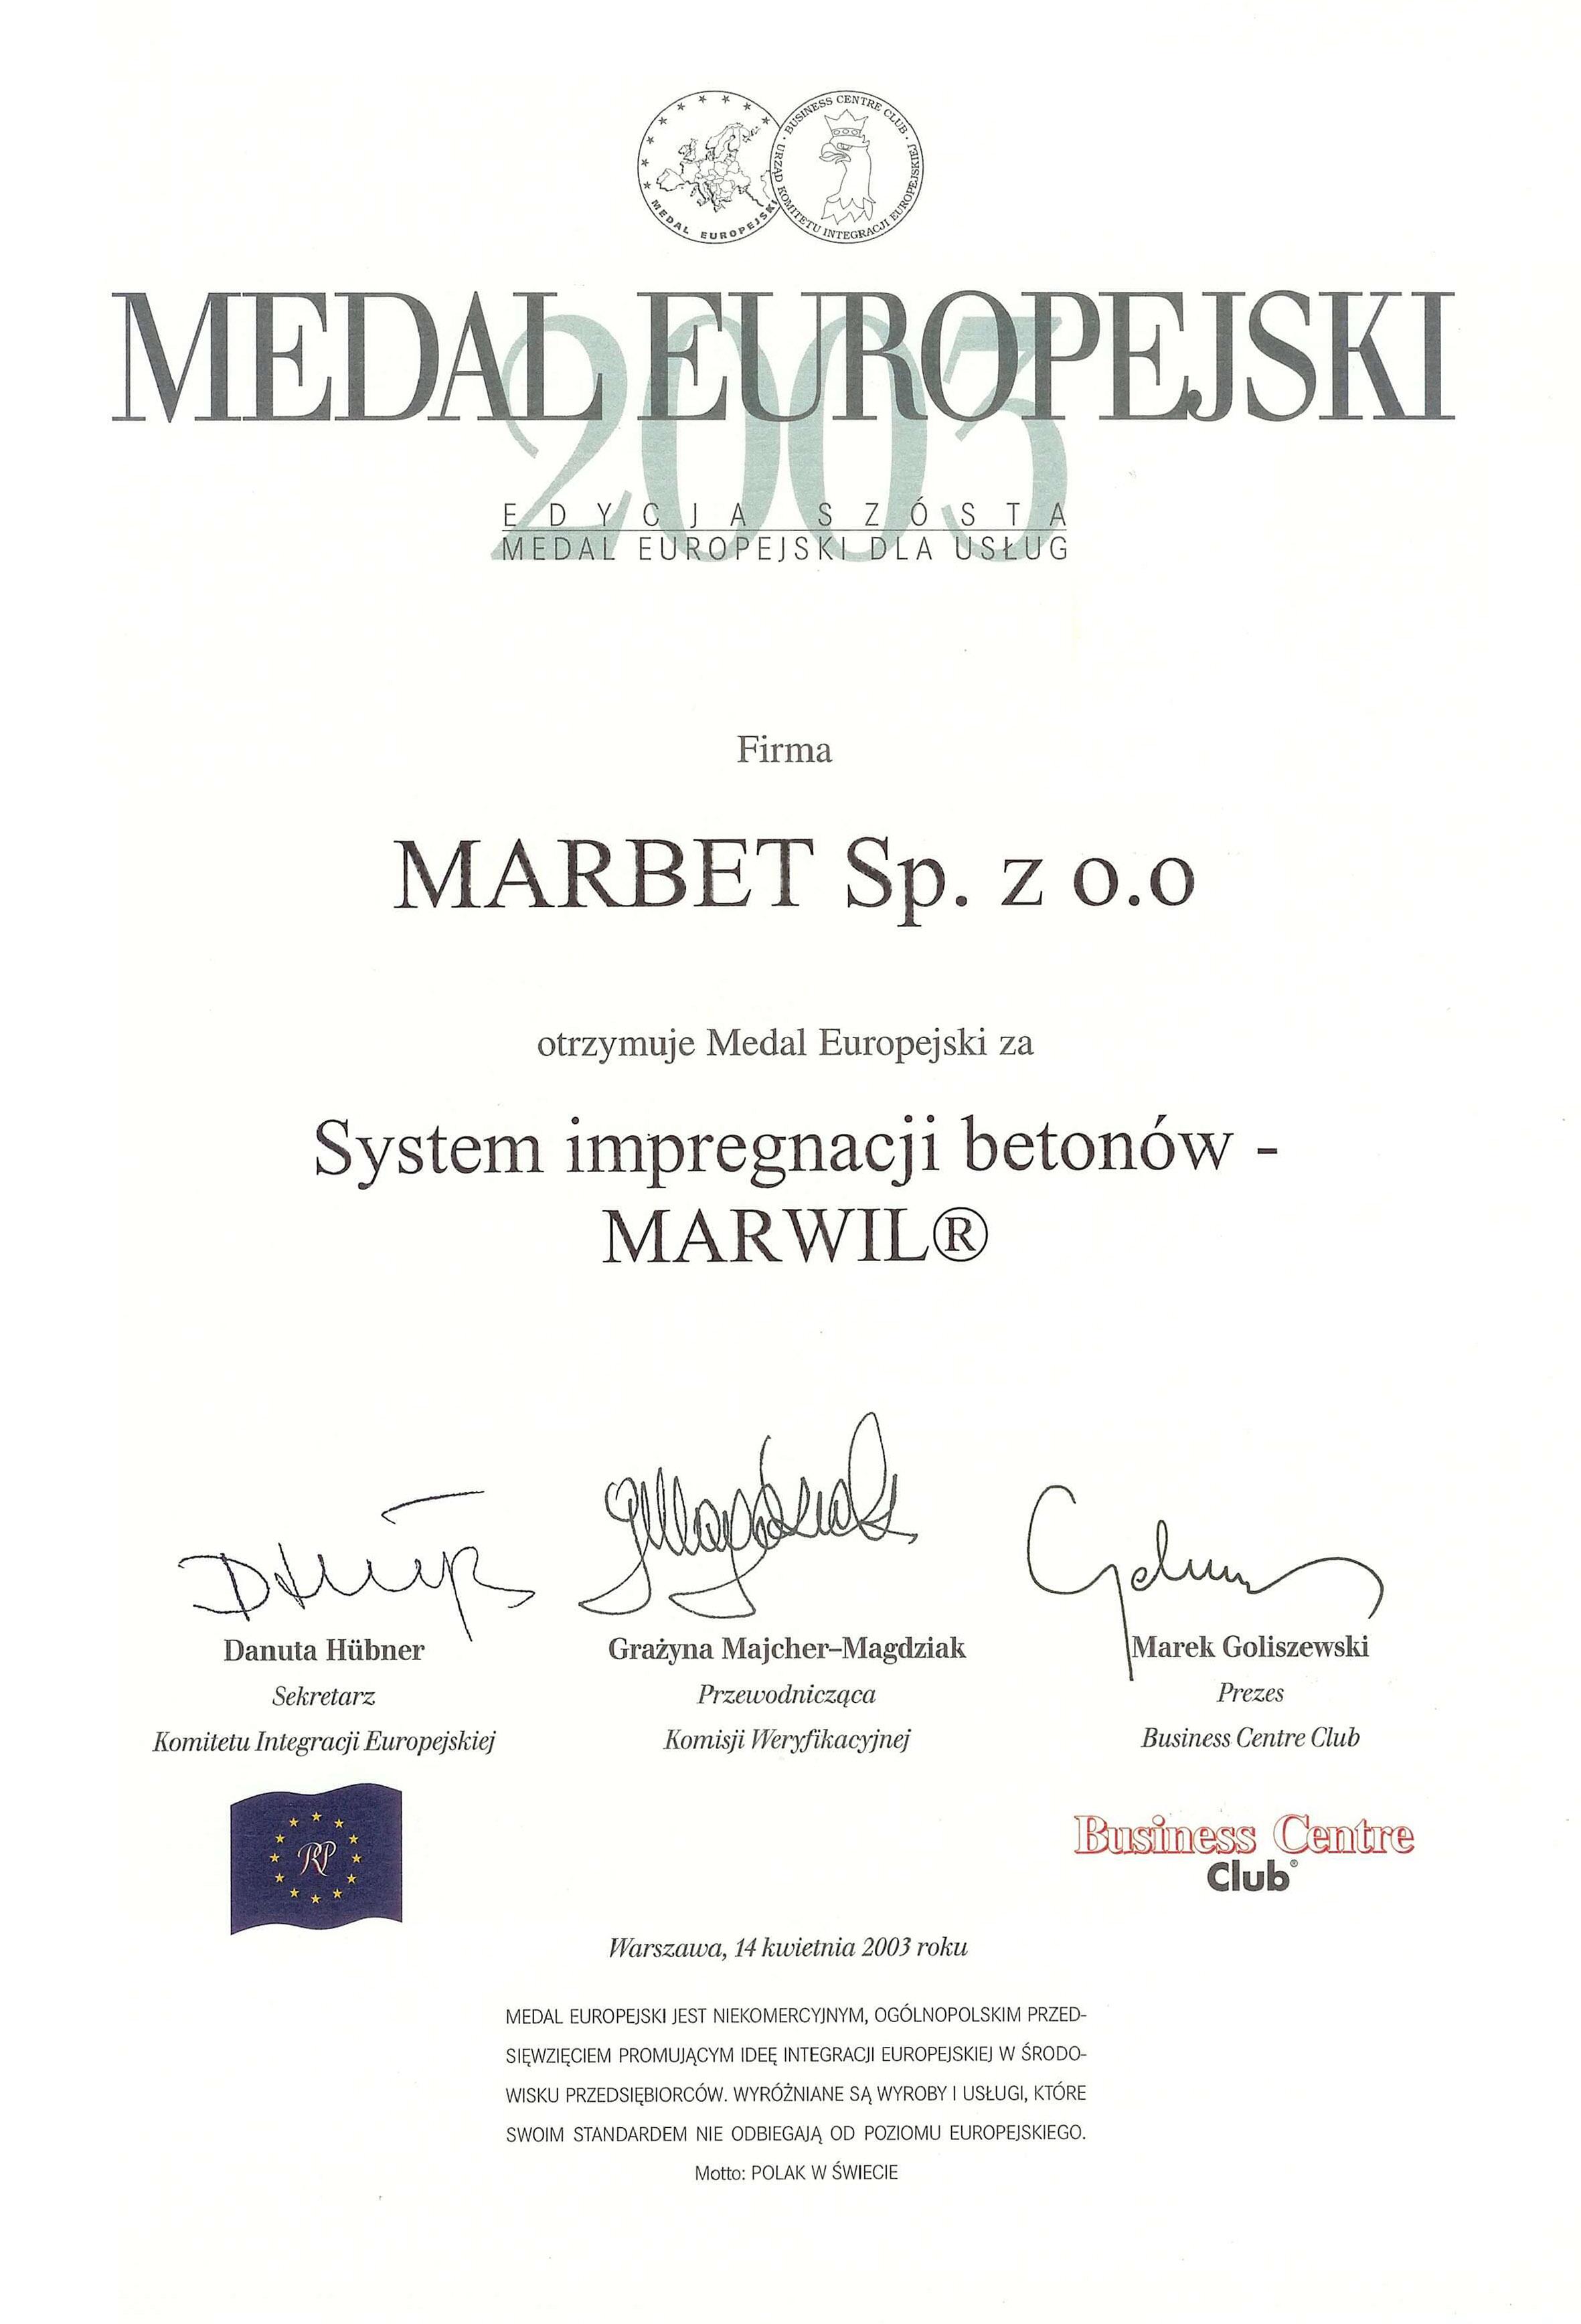 Medal Europejski 2003 - MARWIL- j